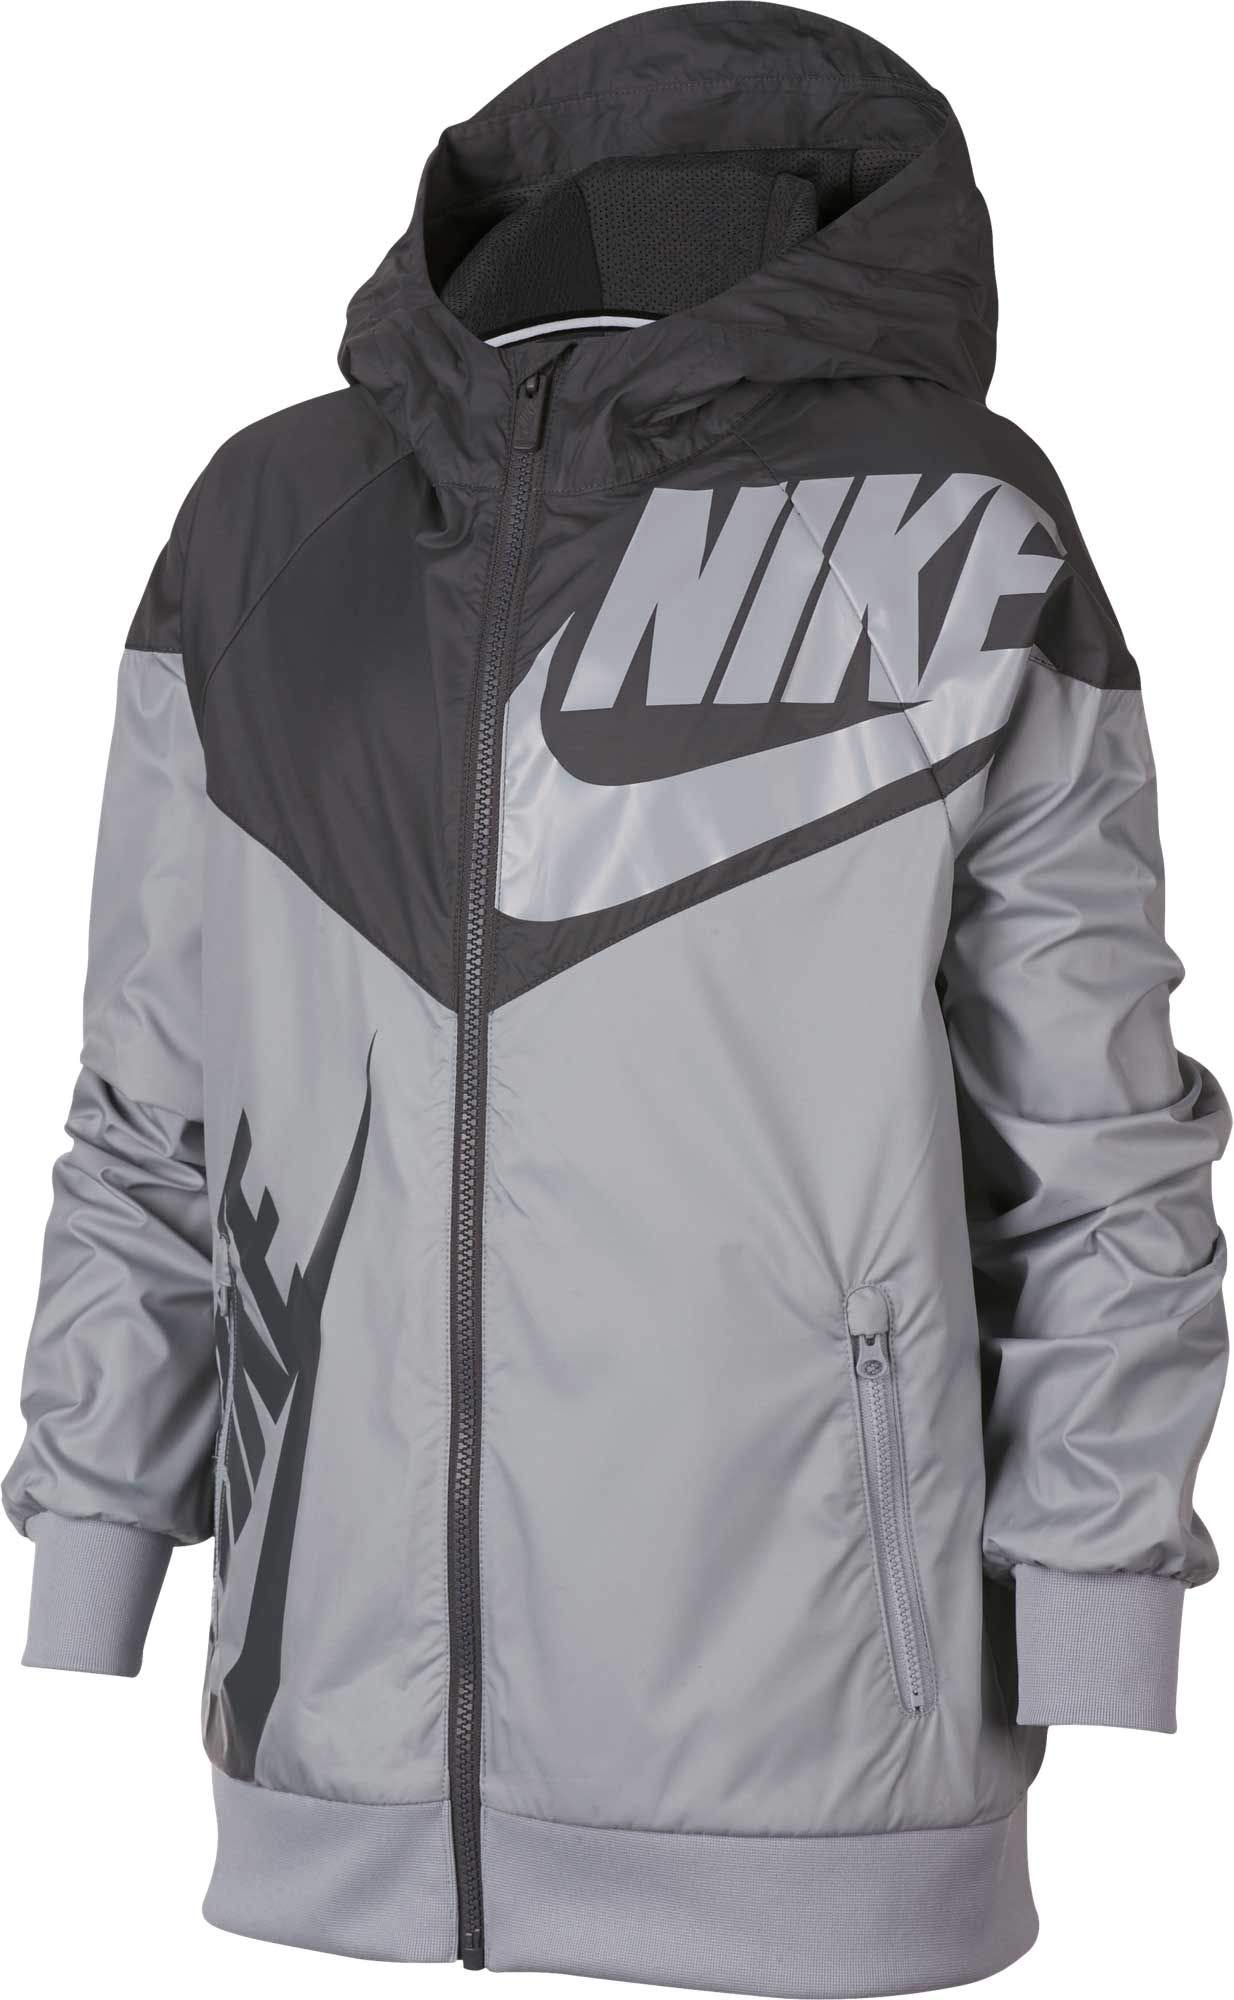 Nike Boy's Sportswear Graphic Windrunner Jacket (Gray, Small)